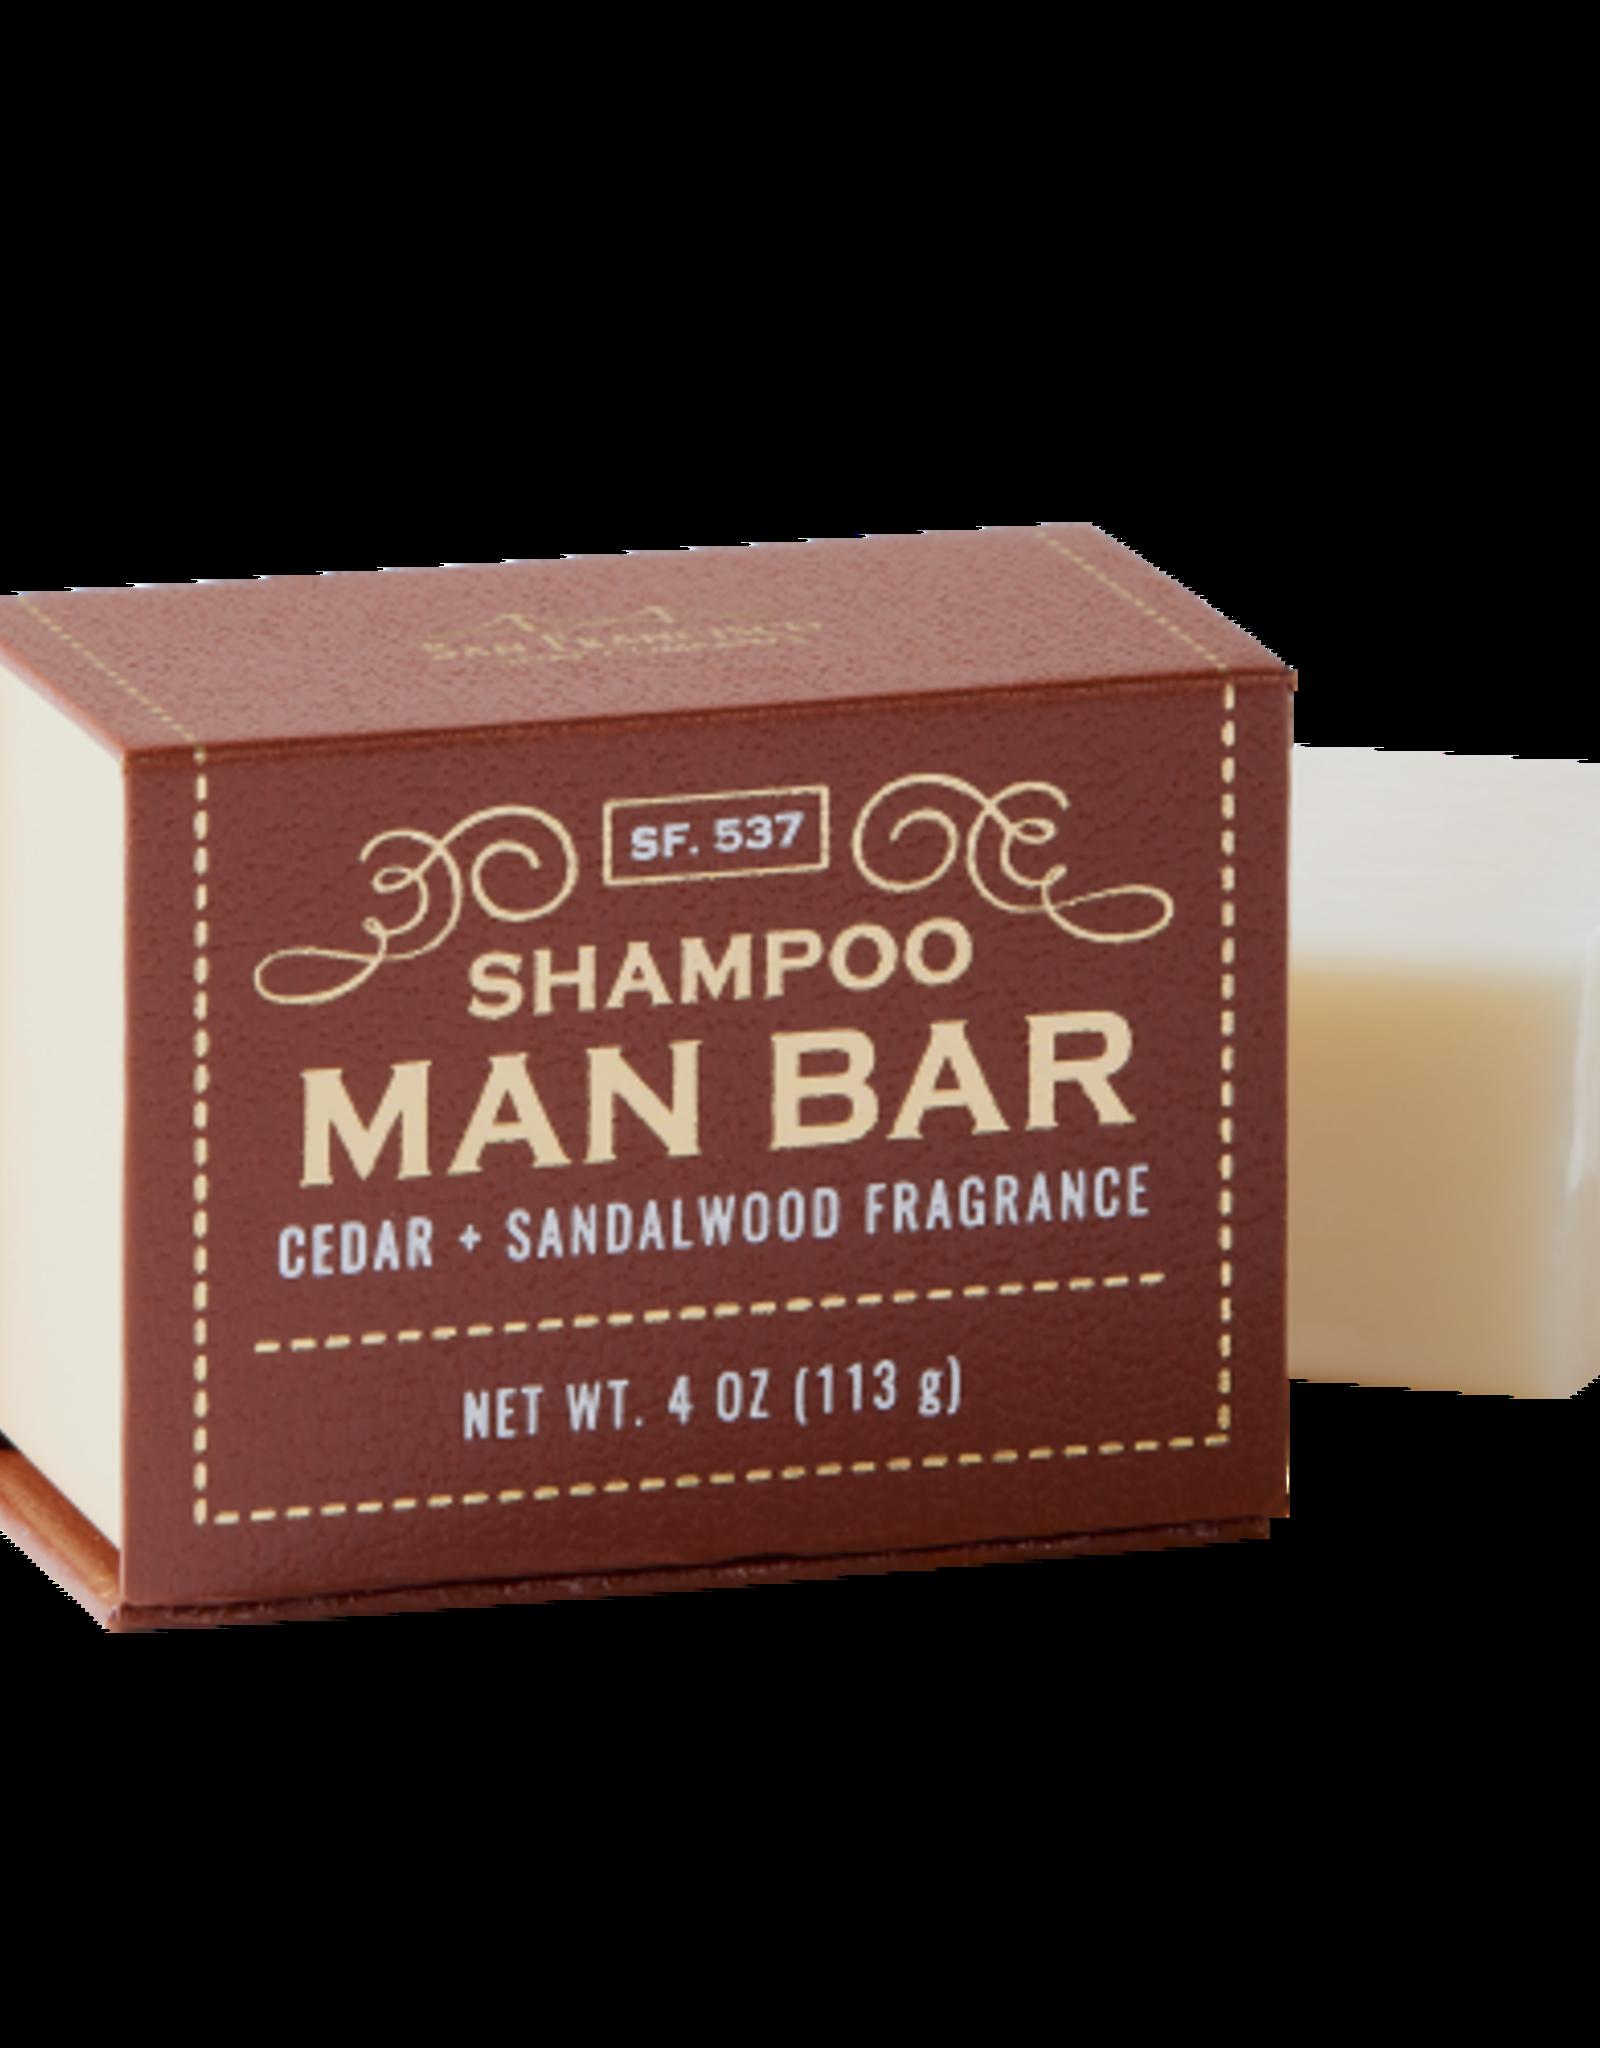 SAN FRANCISCO SOAP COMPANY SHAMPOO BAR CEDAR AND SANDALWOOD